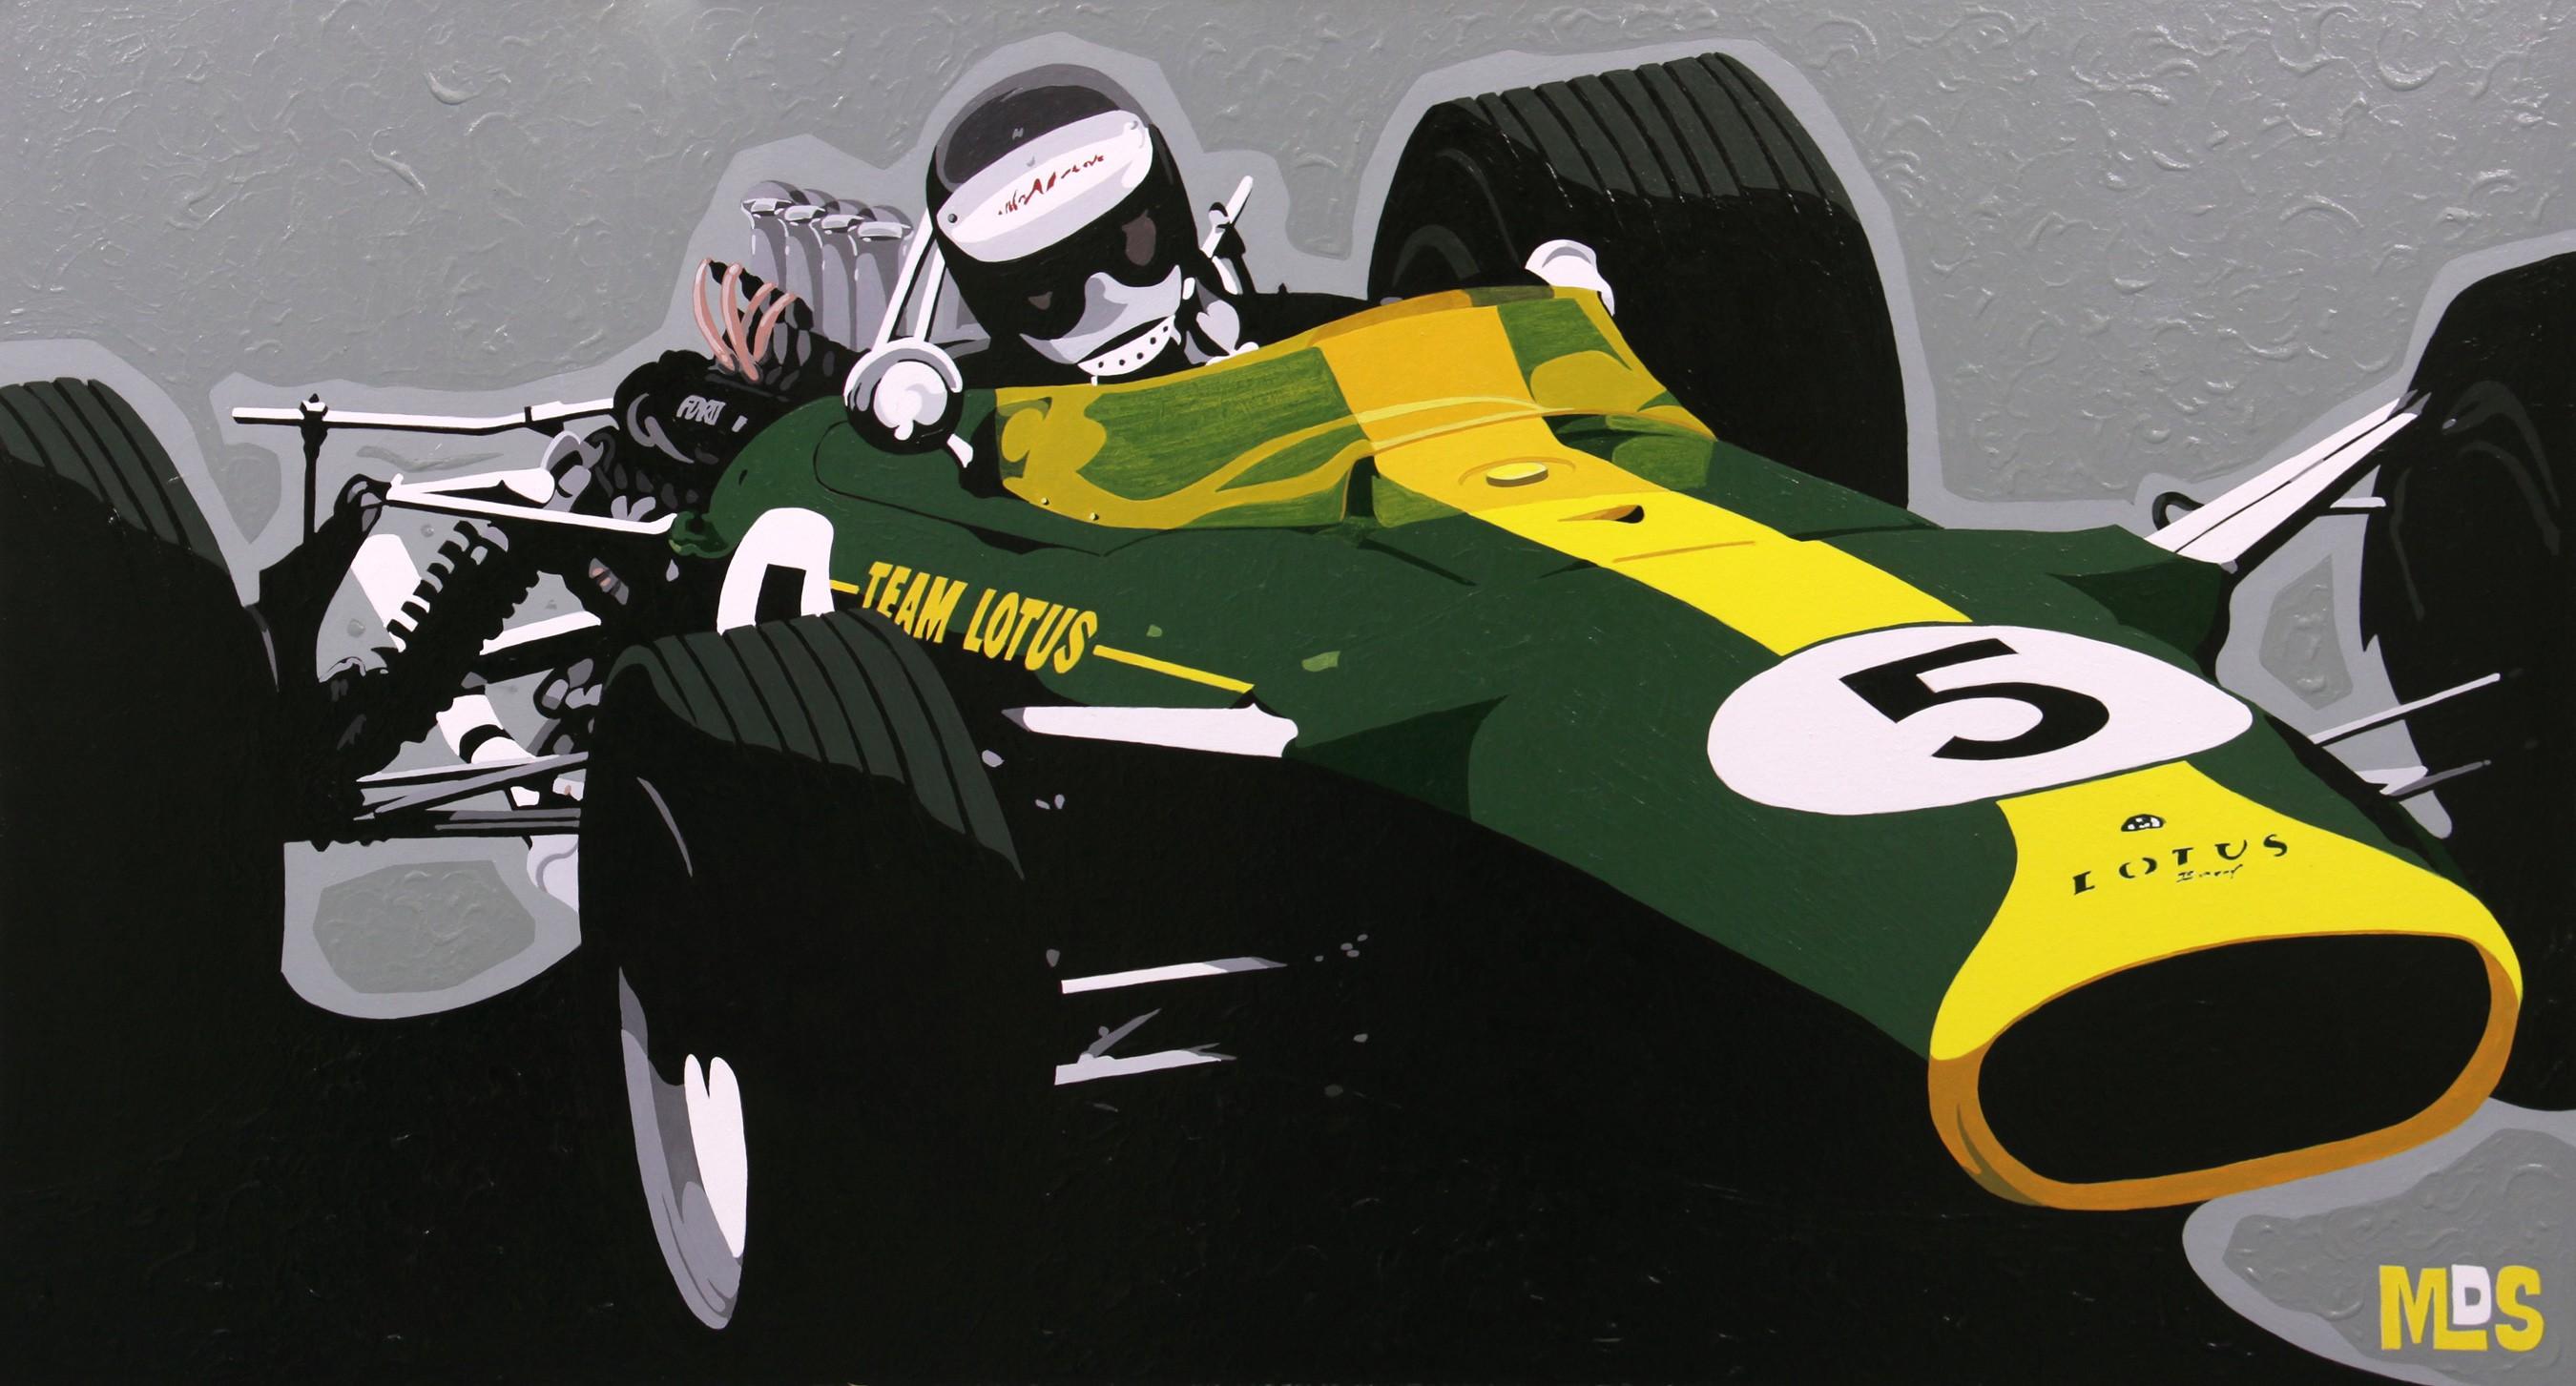 Jim Clark im Lotus 49 - 1967